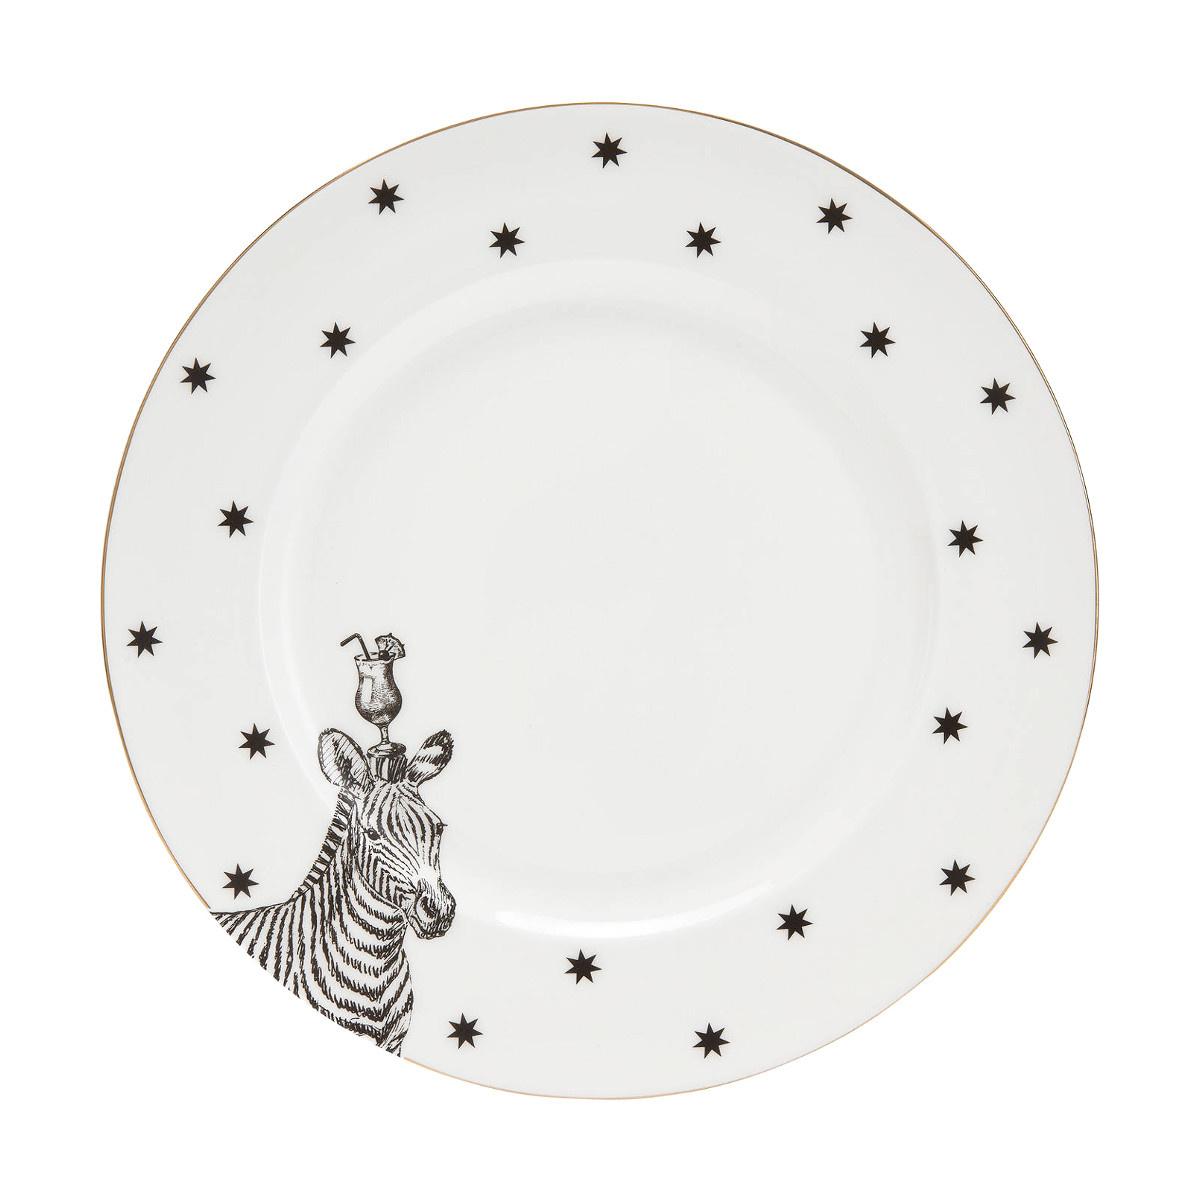 Yvonne Ellen Yvonne Ellen London Monochrome Set of 2 Dinner PLates Ø 26,5 cm - Zebra - Bone China